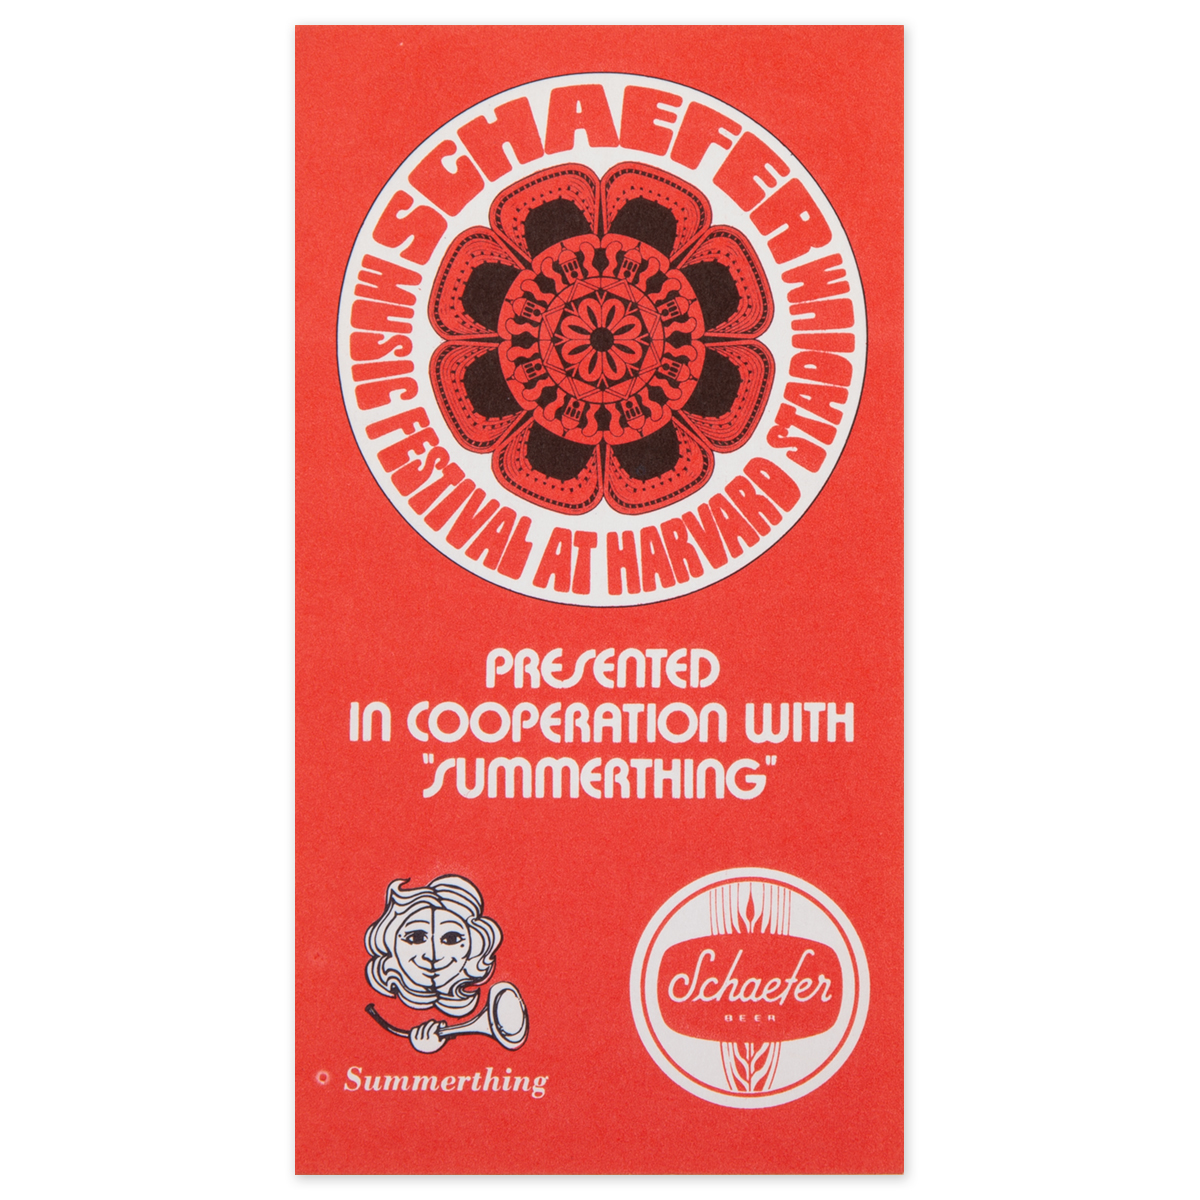 1970 Schaefer Music Festival Season Pass